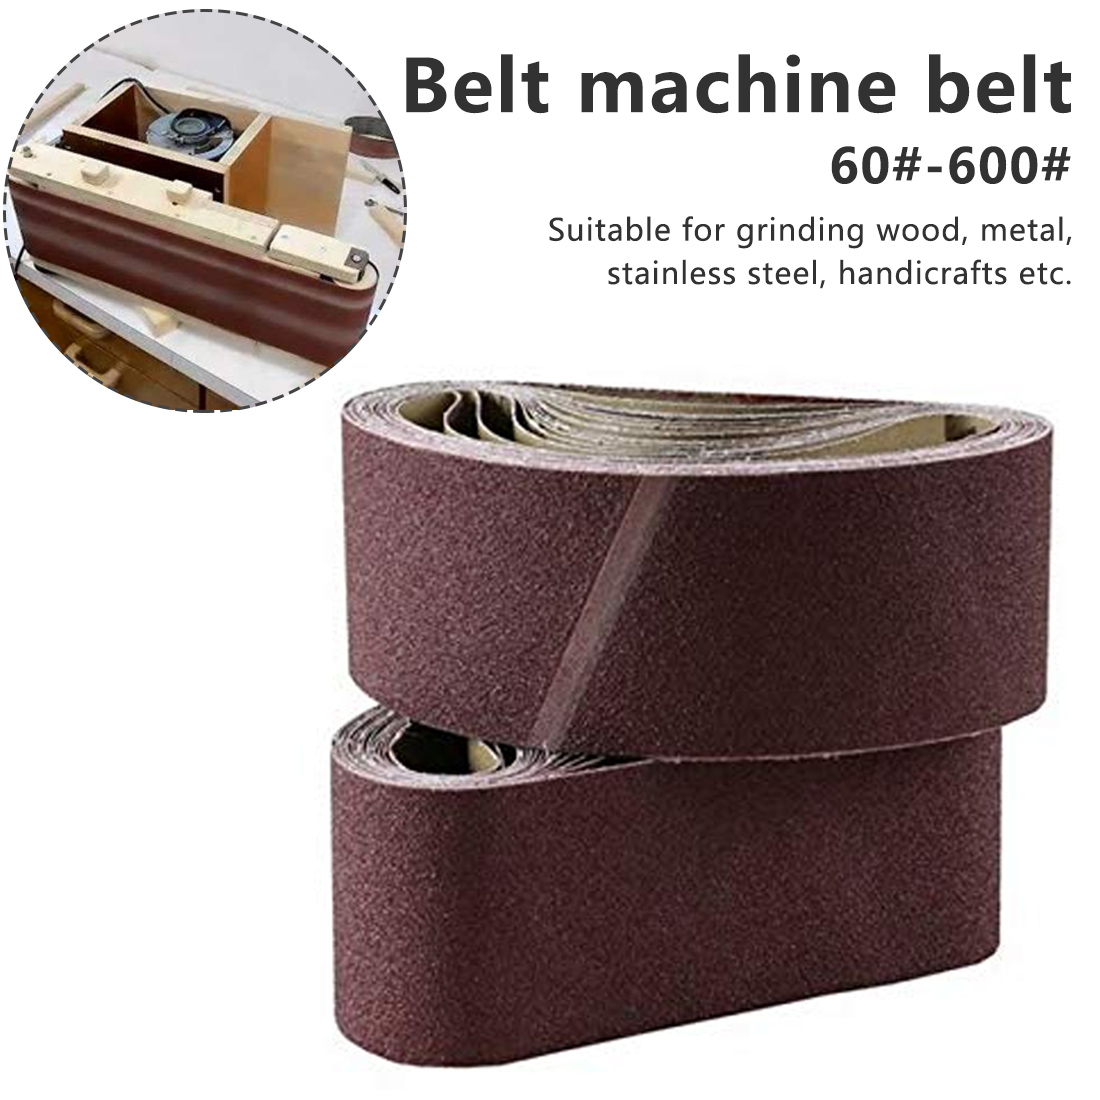 Sanding Belts 60-600 Grits Sandpaper Abrasive Bands For Sander Power Rotary Tools Dremel Accessories Abrasive Tool